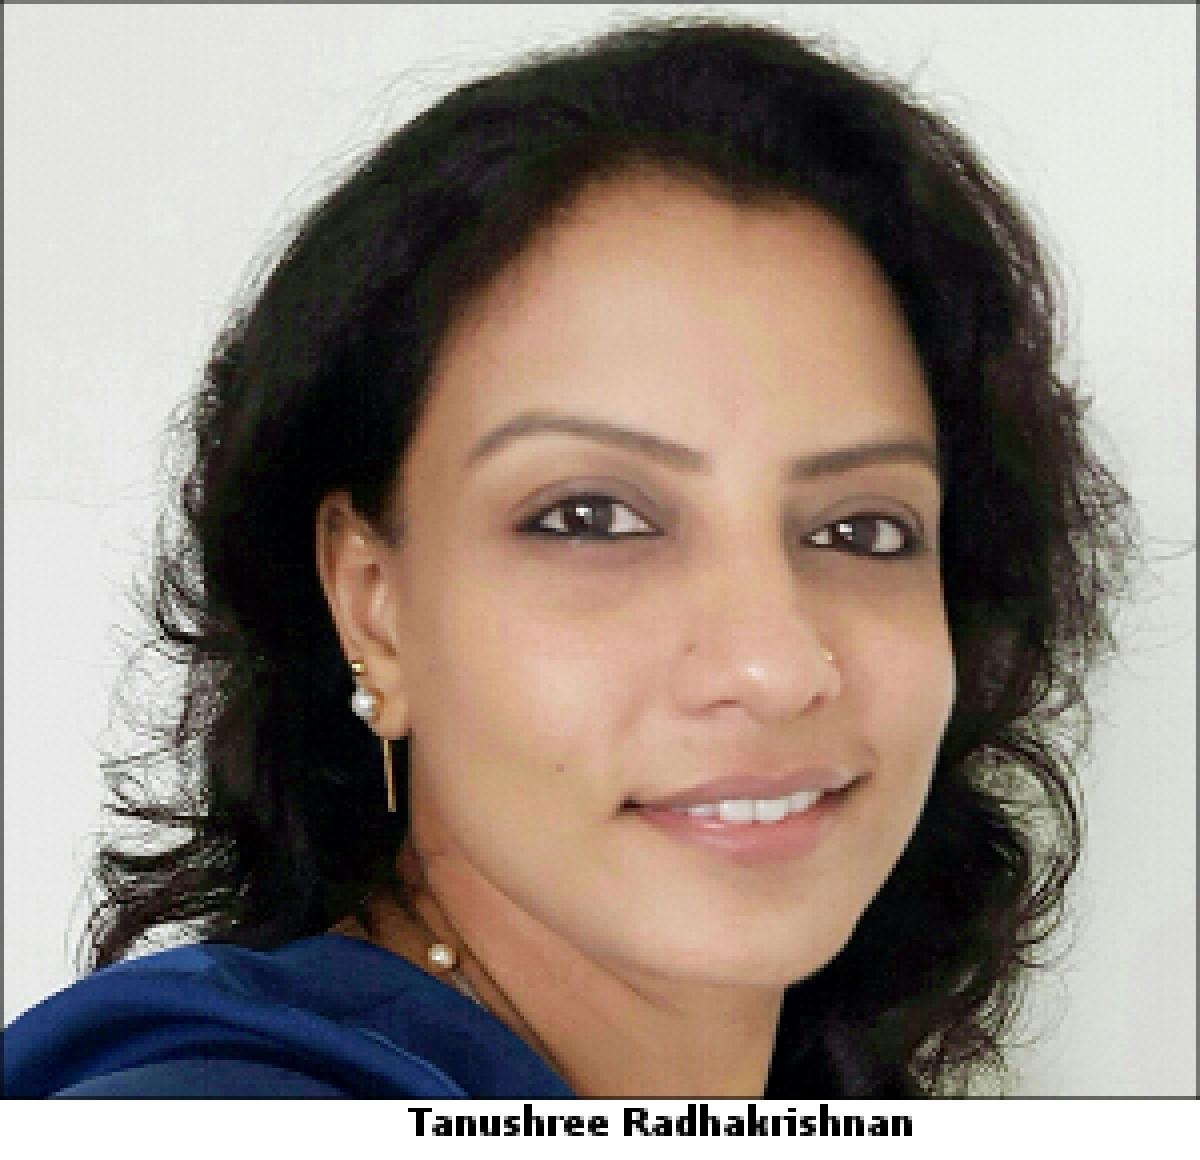 GroupM's Tanushree Radhakrishnan joins ZenithOptimedia